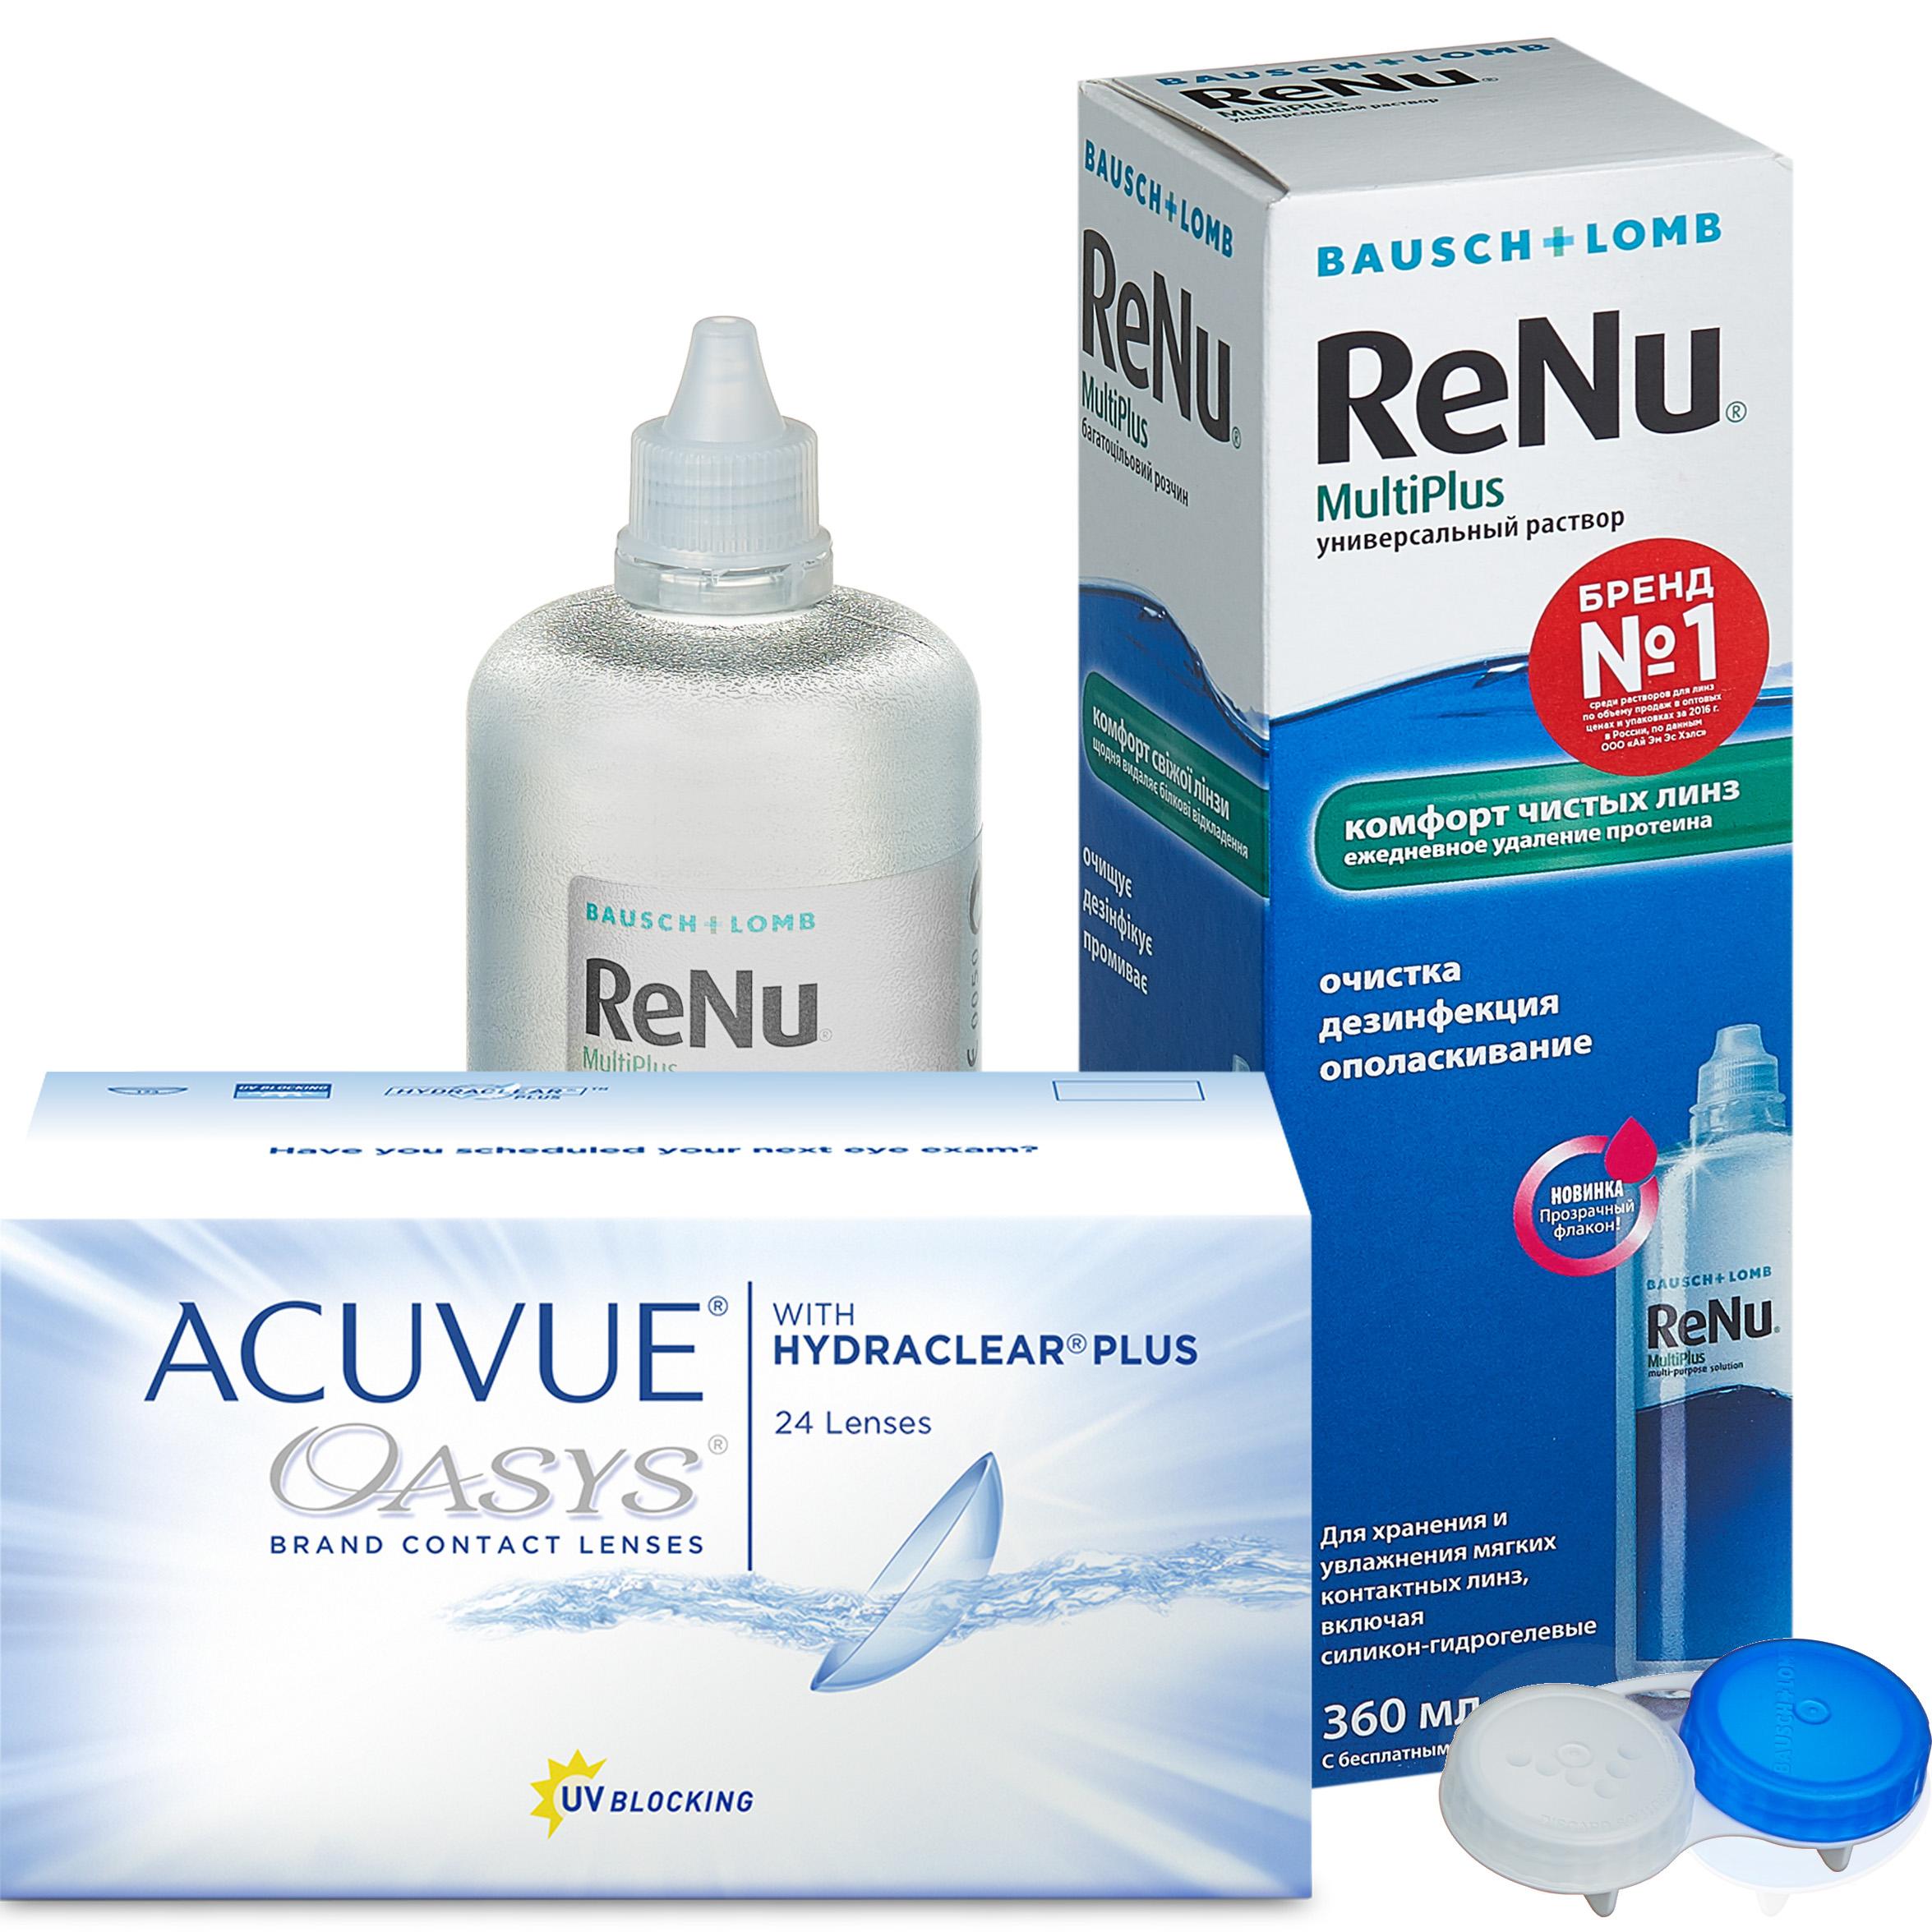 Купить Oasys with Hydraclear Plus 24 линзы + ReNu MultiPlus, Линзы Acuvue Oasys with Hydraclear Plus 24 линзы R 8.8 +3, 00 + ReNu Multi Plus 360 мл